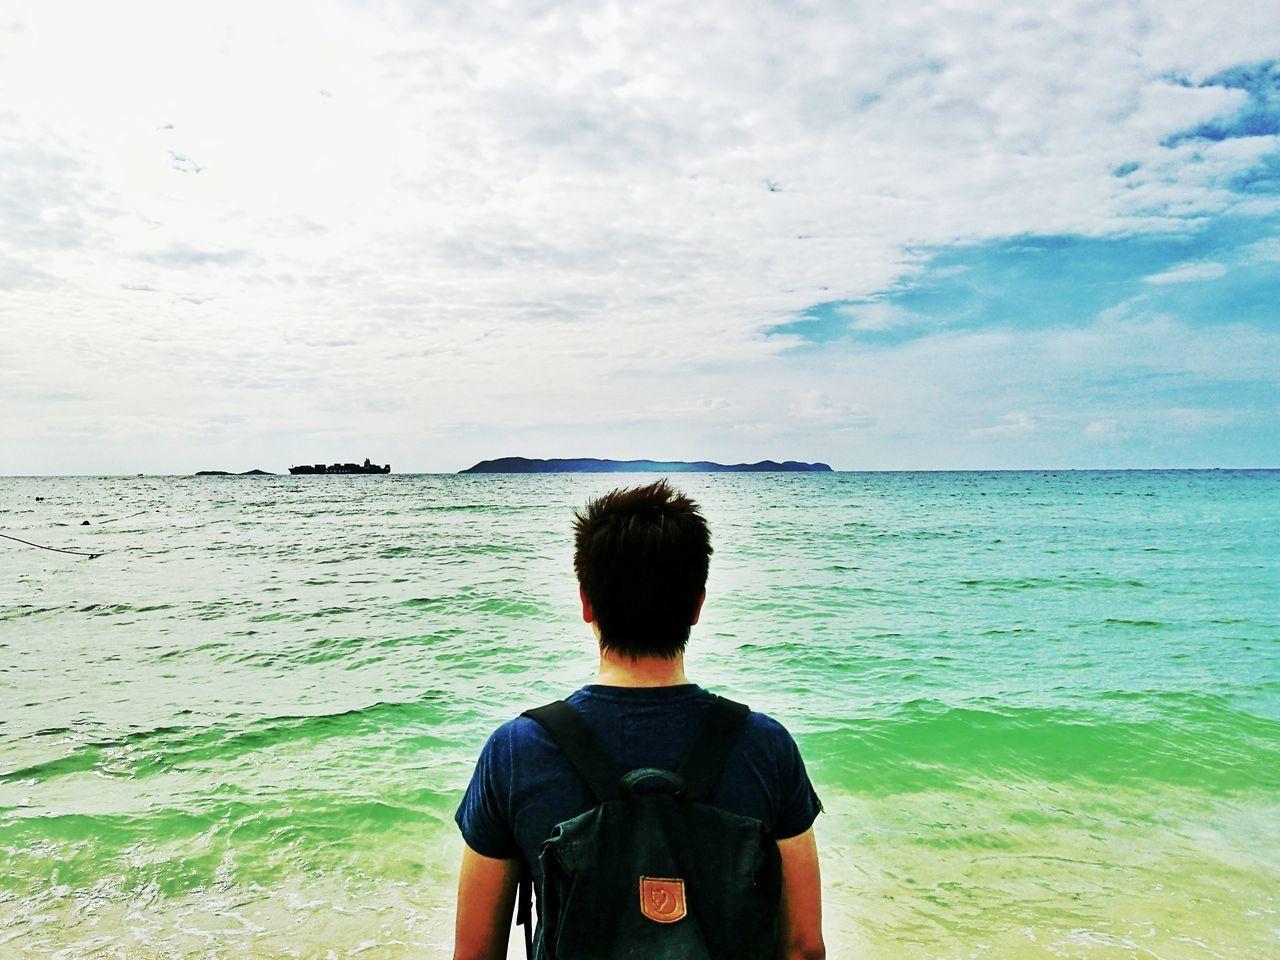 Beautiful stock photos of sonnenschein, rear view, sea, beach, one person